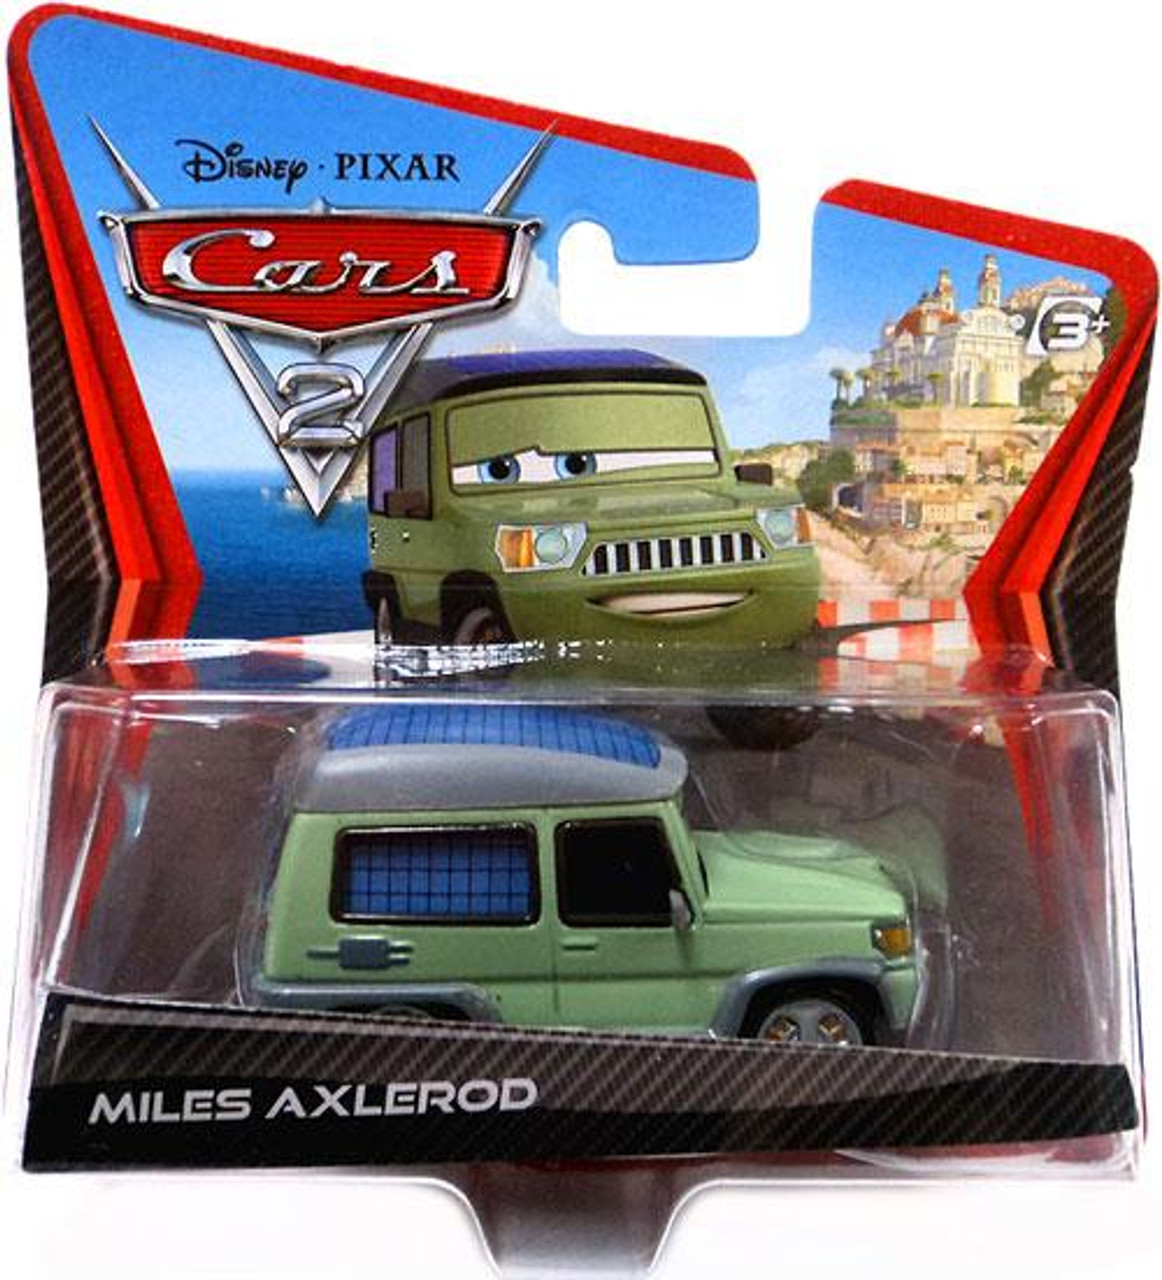 Disney Cars Cars 2 Main Series Miles Axlerod Diecast Car [Wide Card]